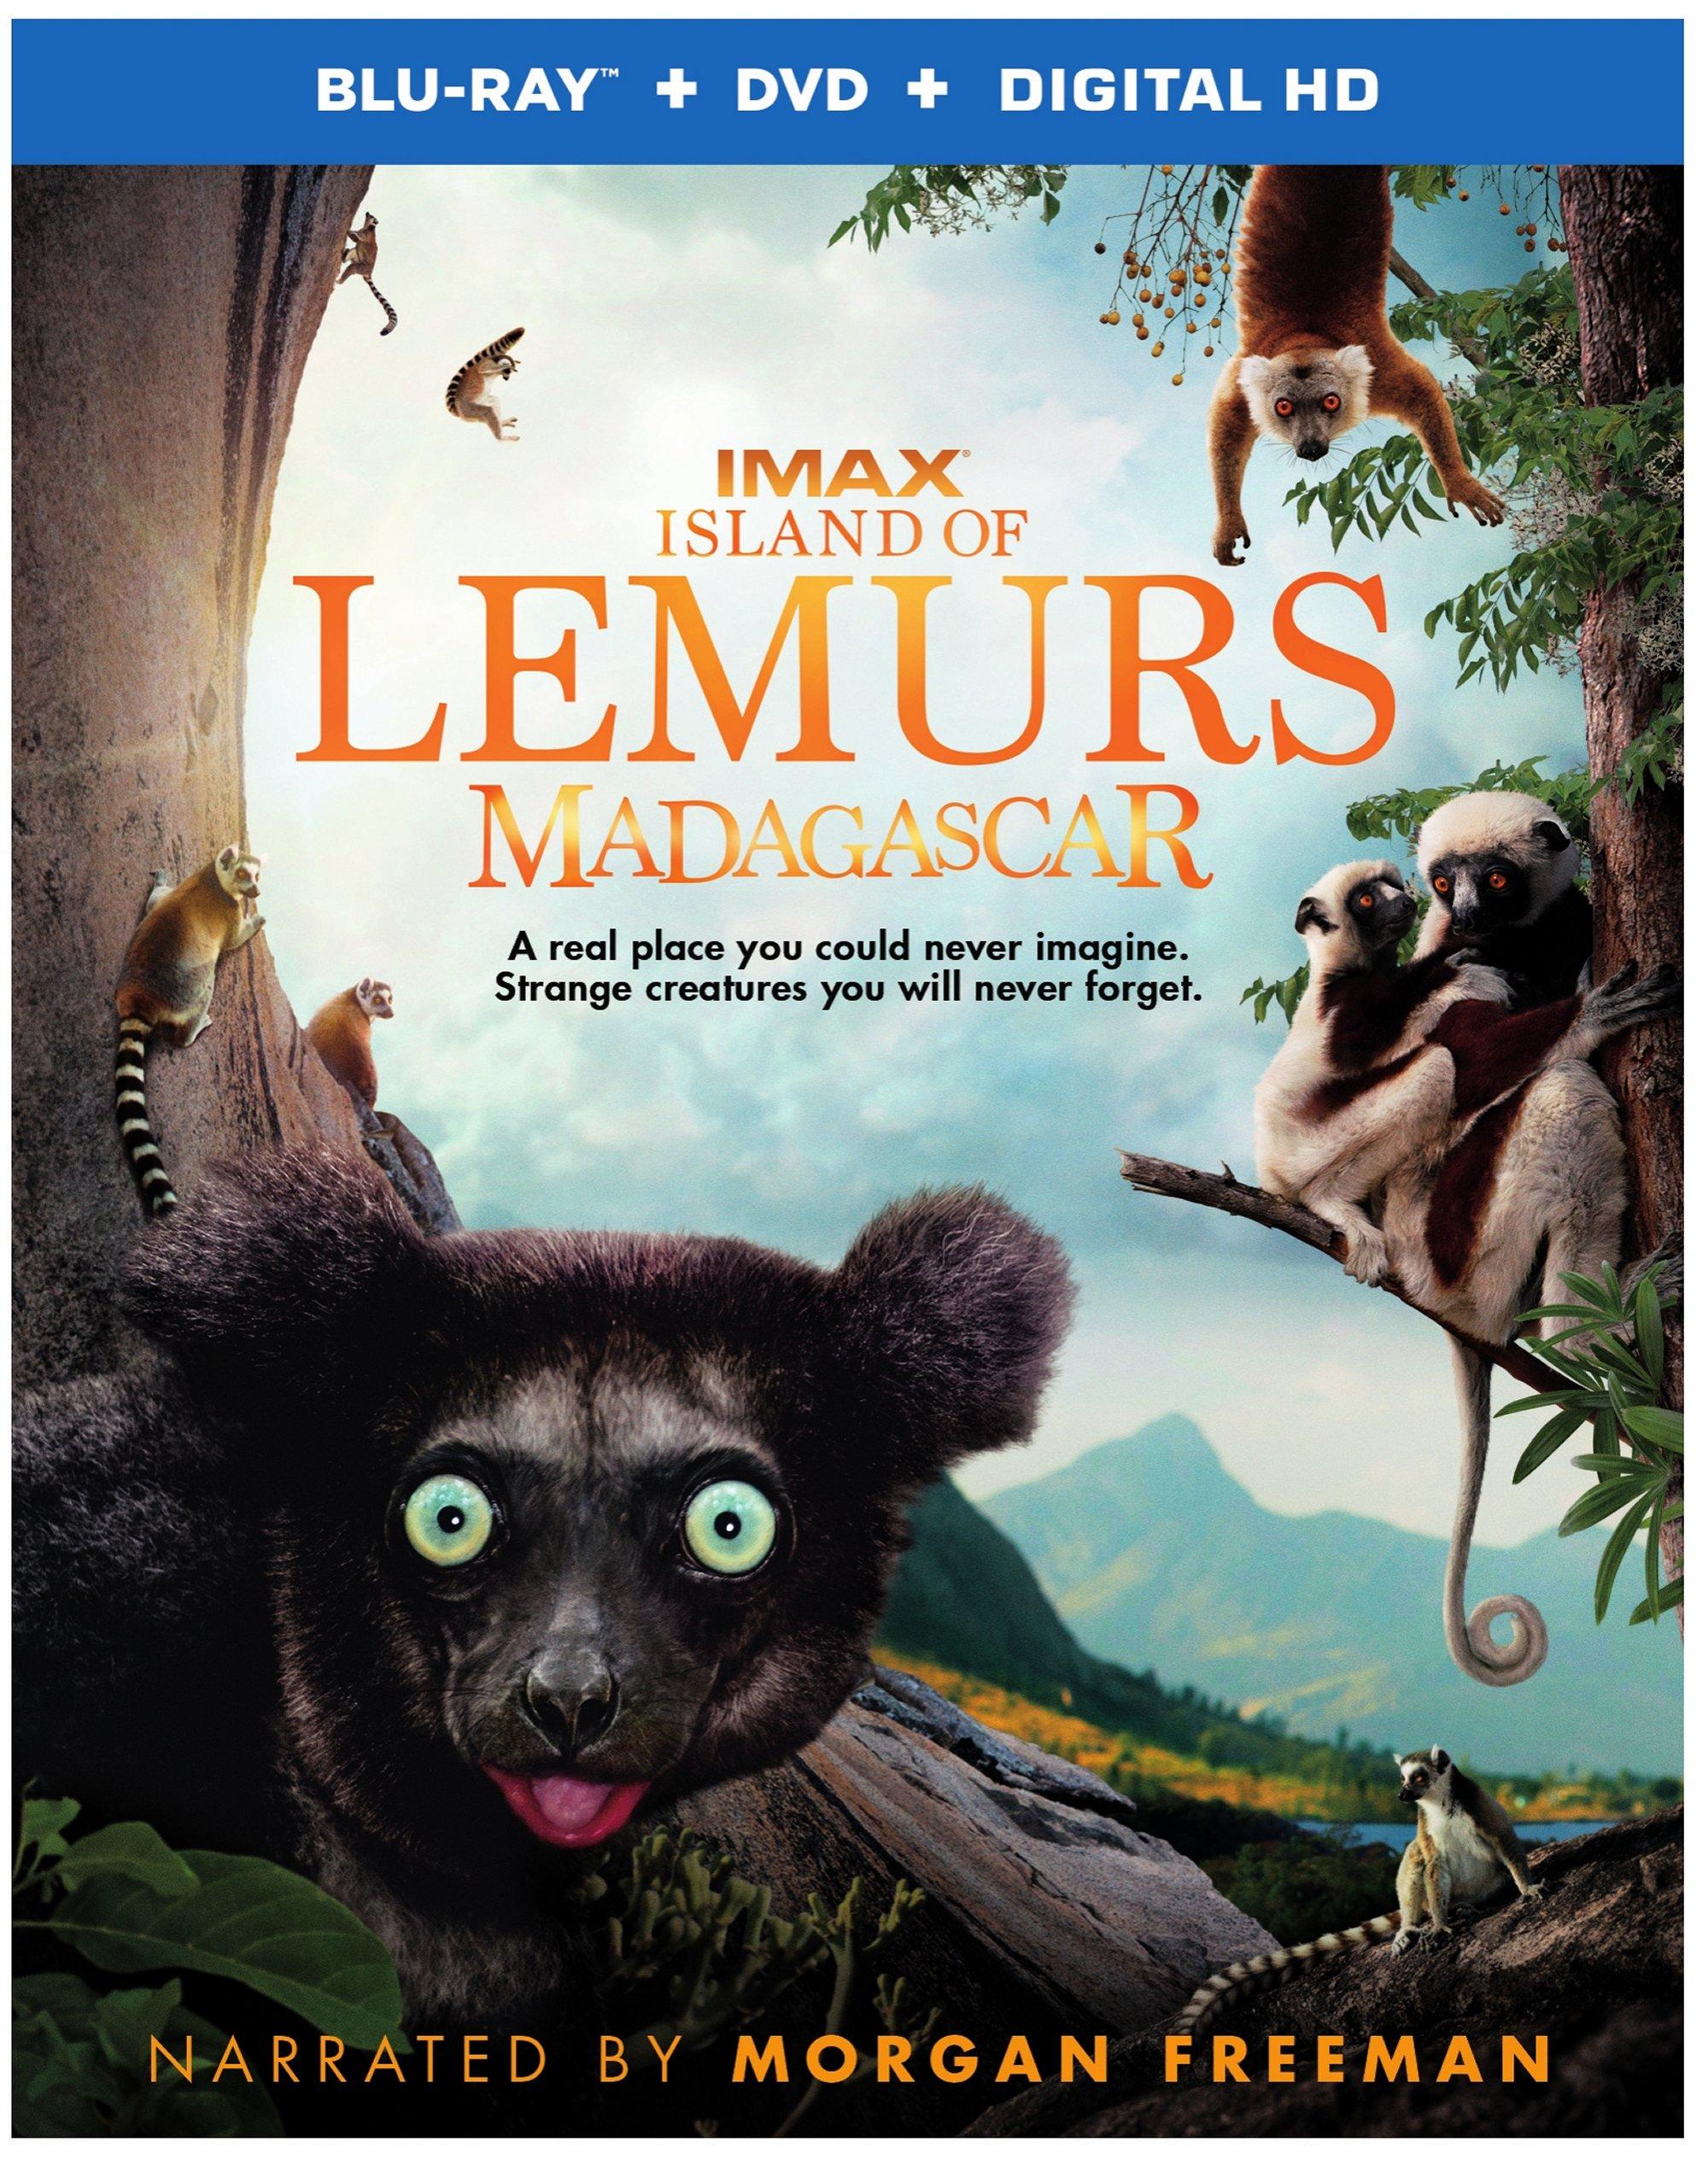 Island of Lemurs: Madagascar Blu-ray Review